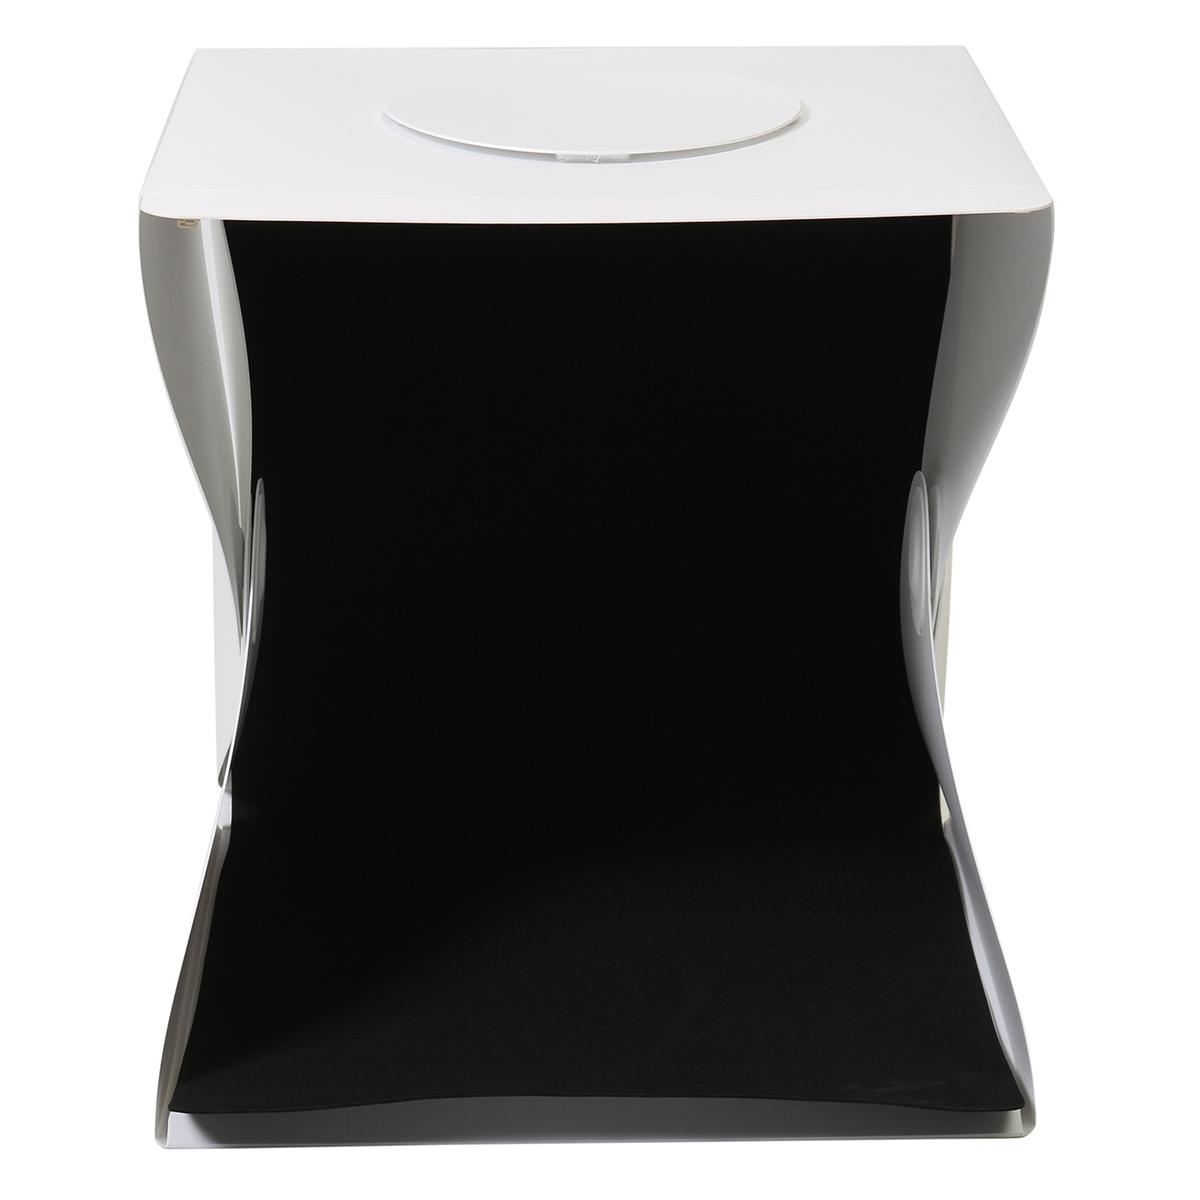 300x300x320mm Photography Studio Softbox Folding Light Box Studio LED Photo Shoot Box Shooting Tent